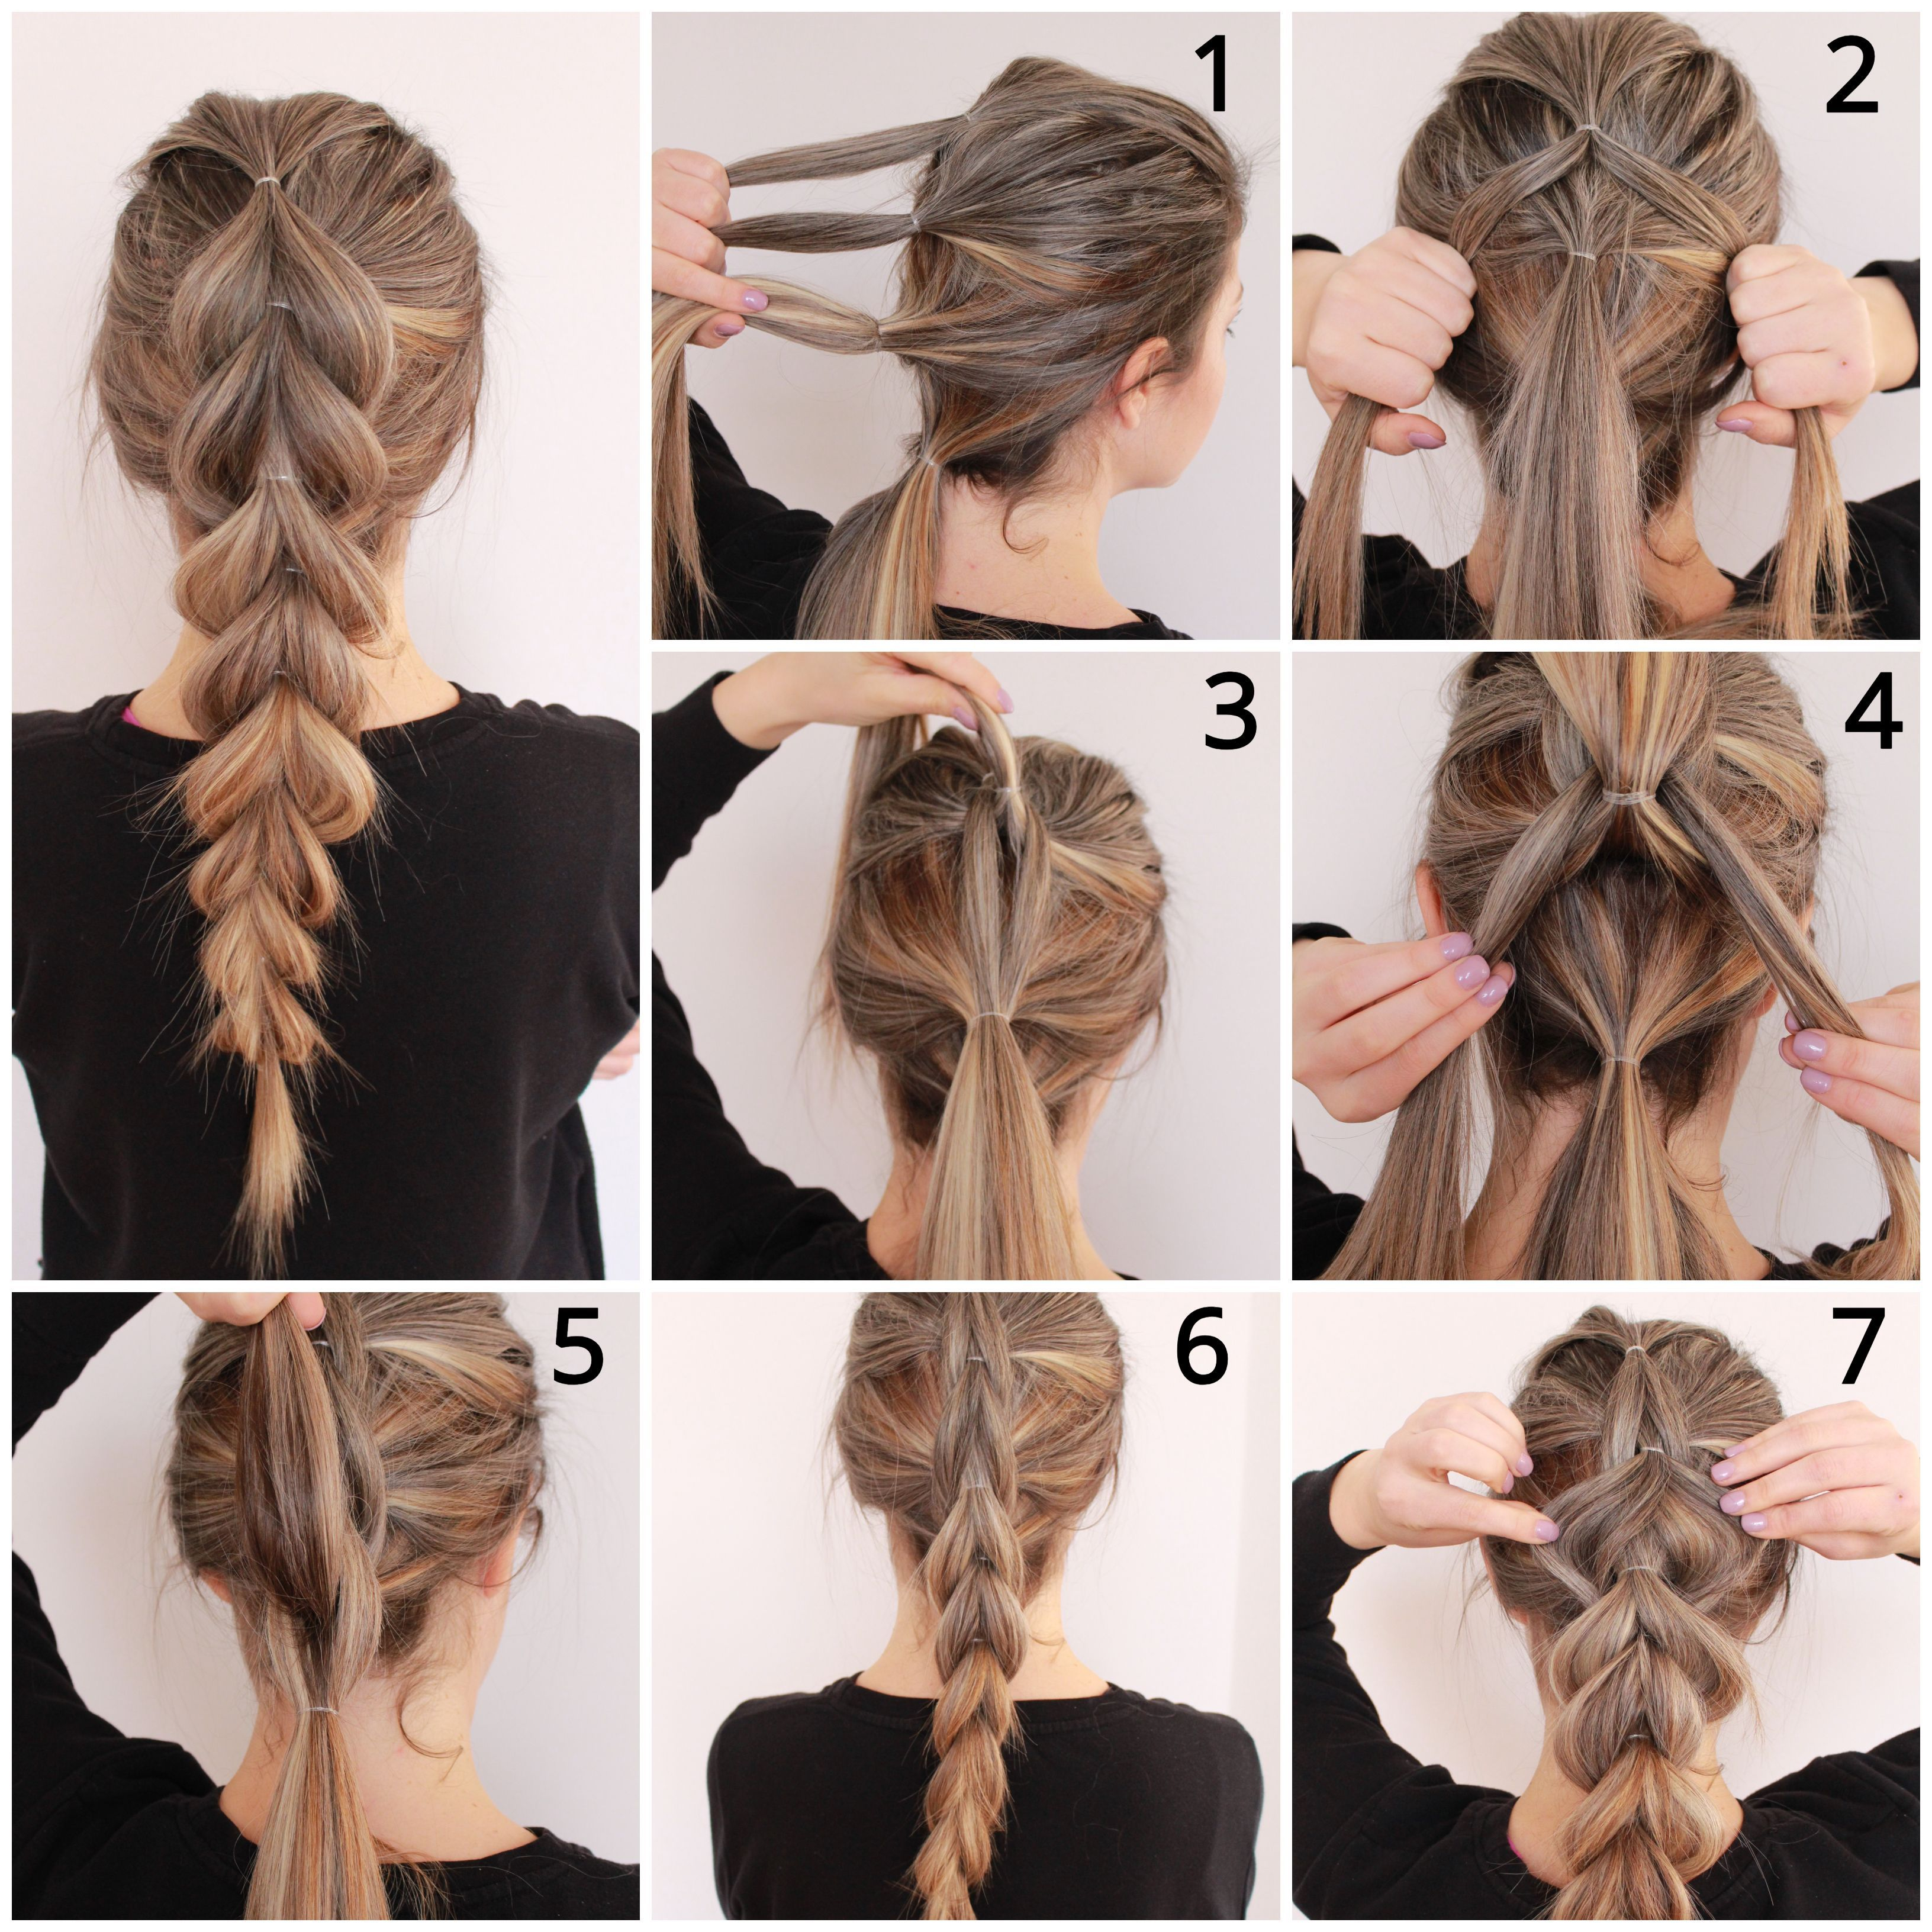 Several Simple Steps Can Create A Gorgeous Updo Hairstyle In 2020 Frisuren Geflochtene Frisuren Flechtfrisuren